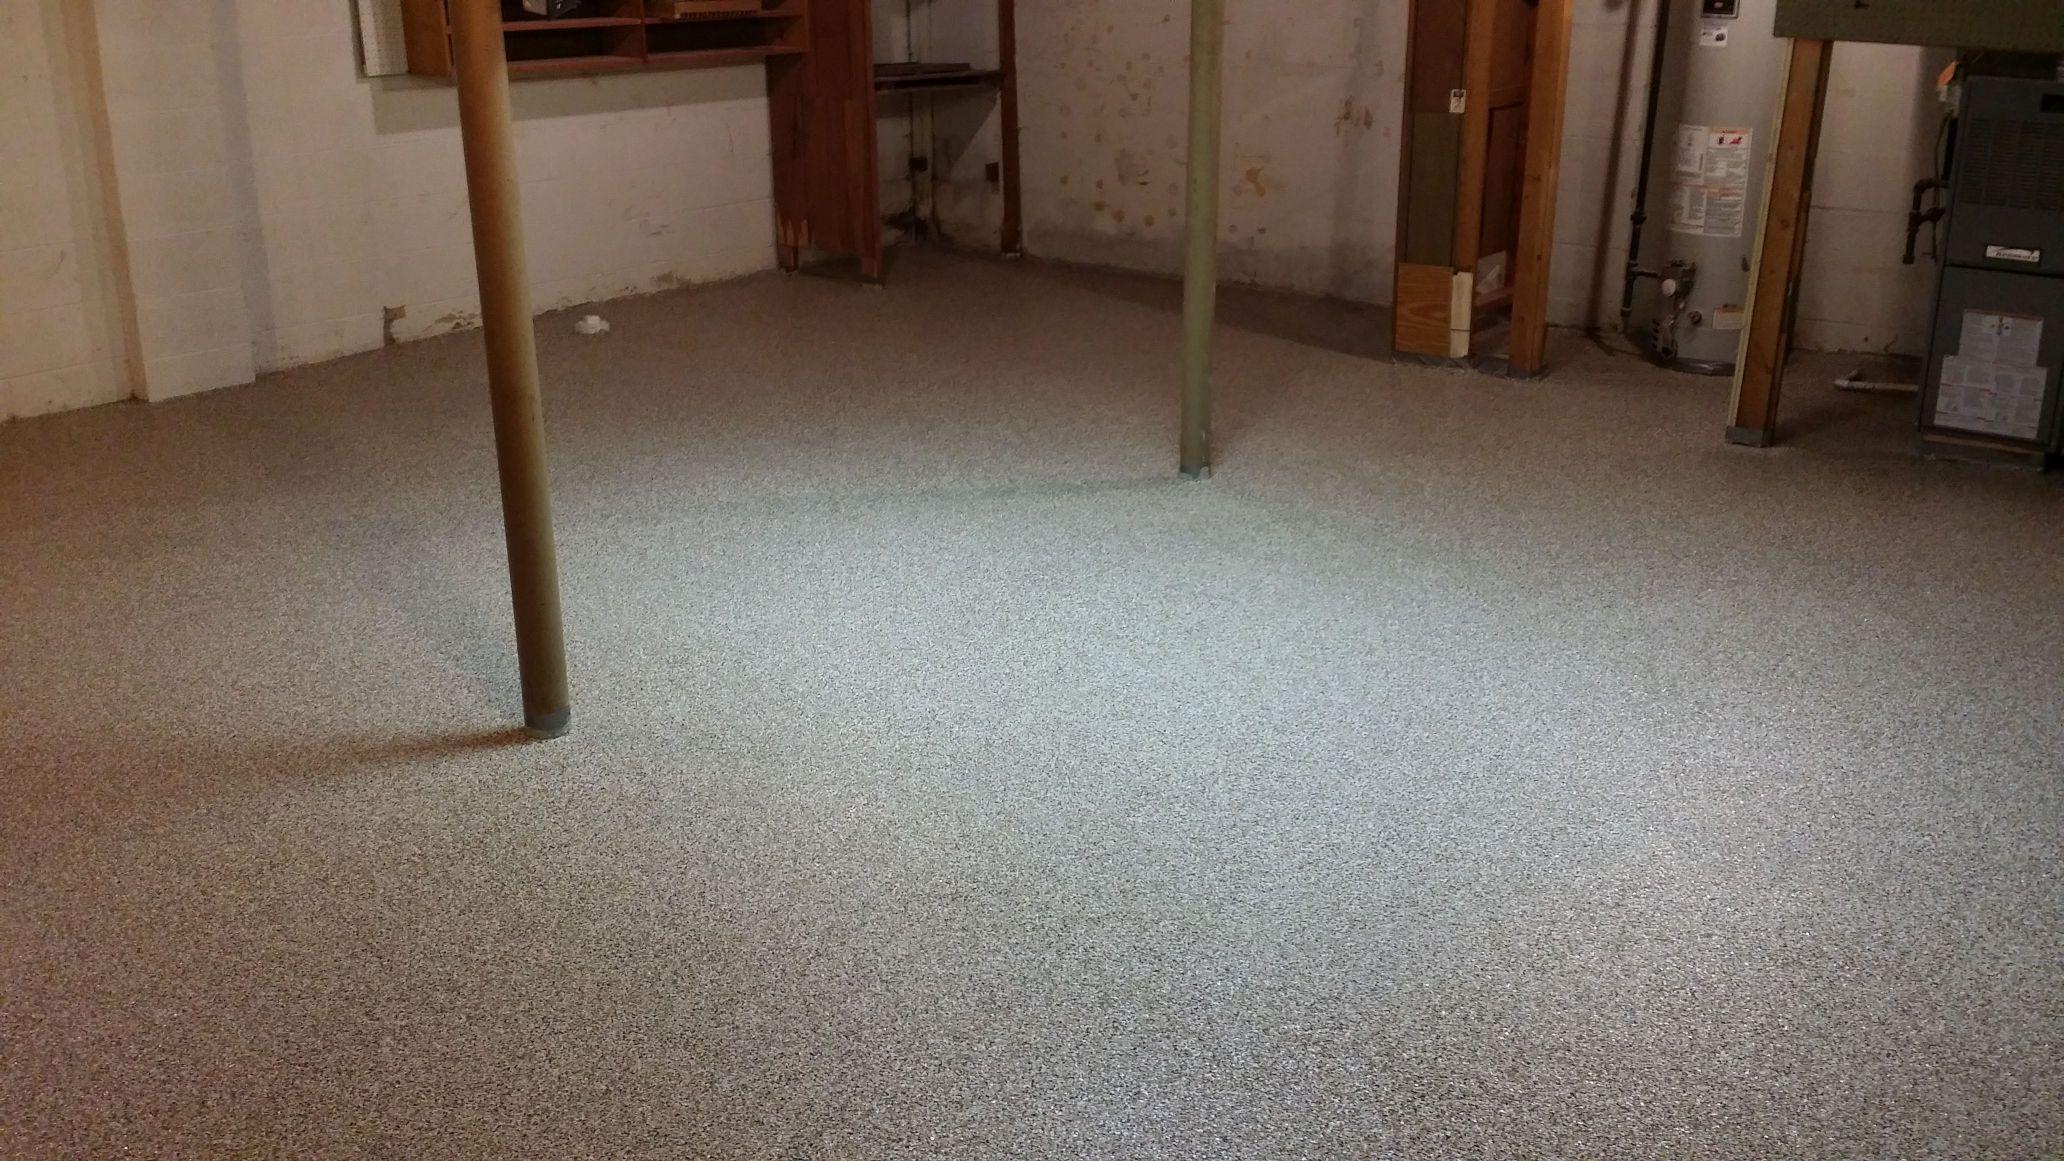 marvelous-basement-waterproofing-flooring-solution-columbus-ohio